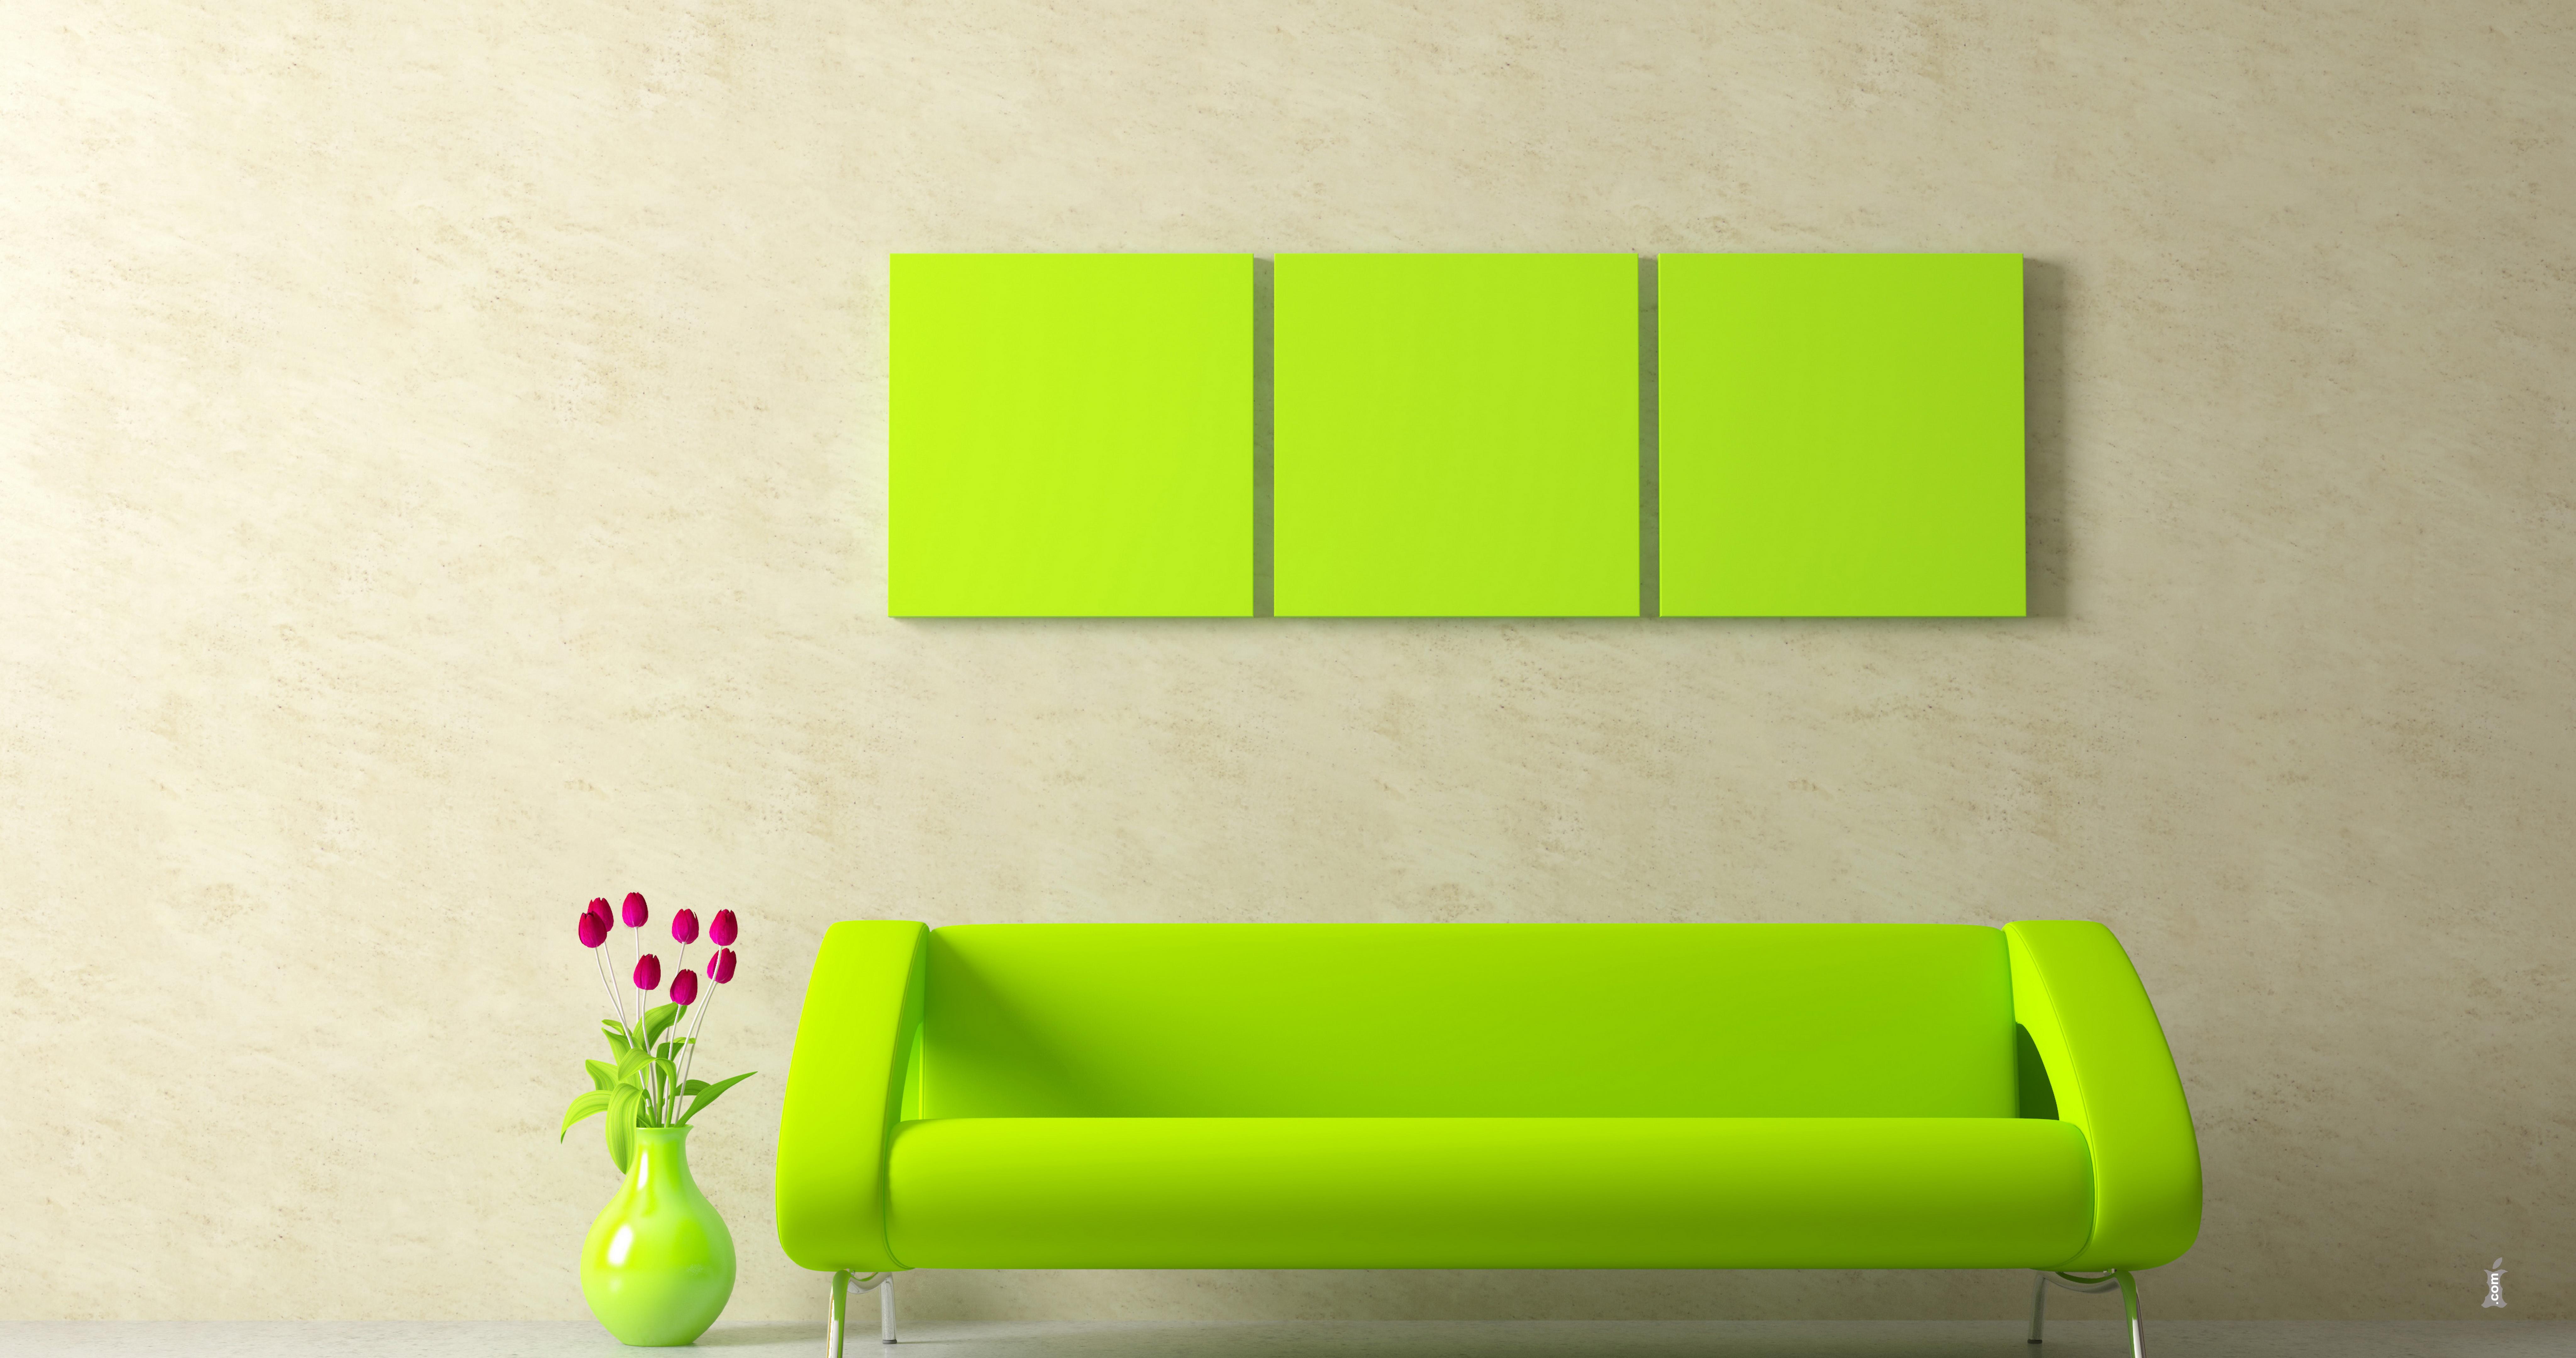 interior-wallpapers-8192×4320-8K-32